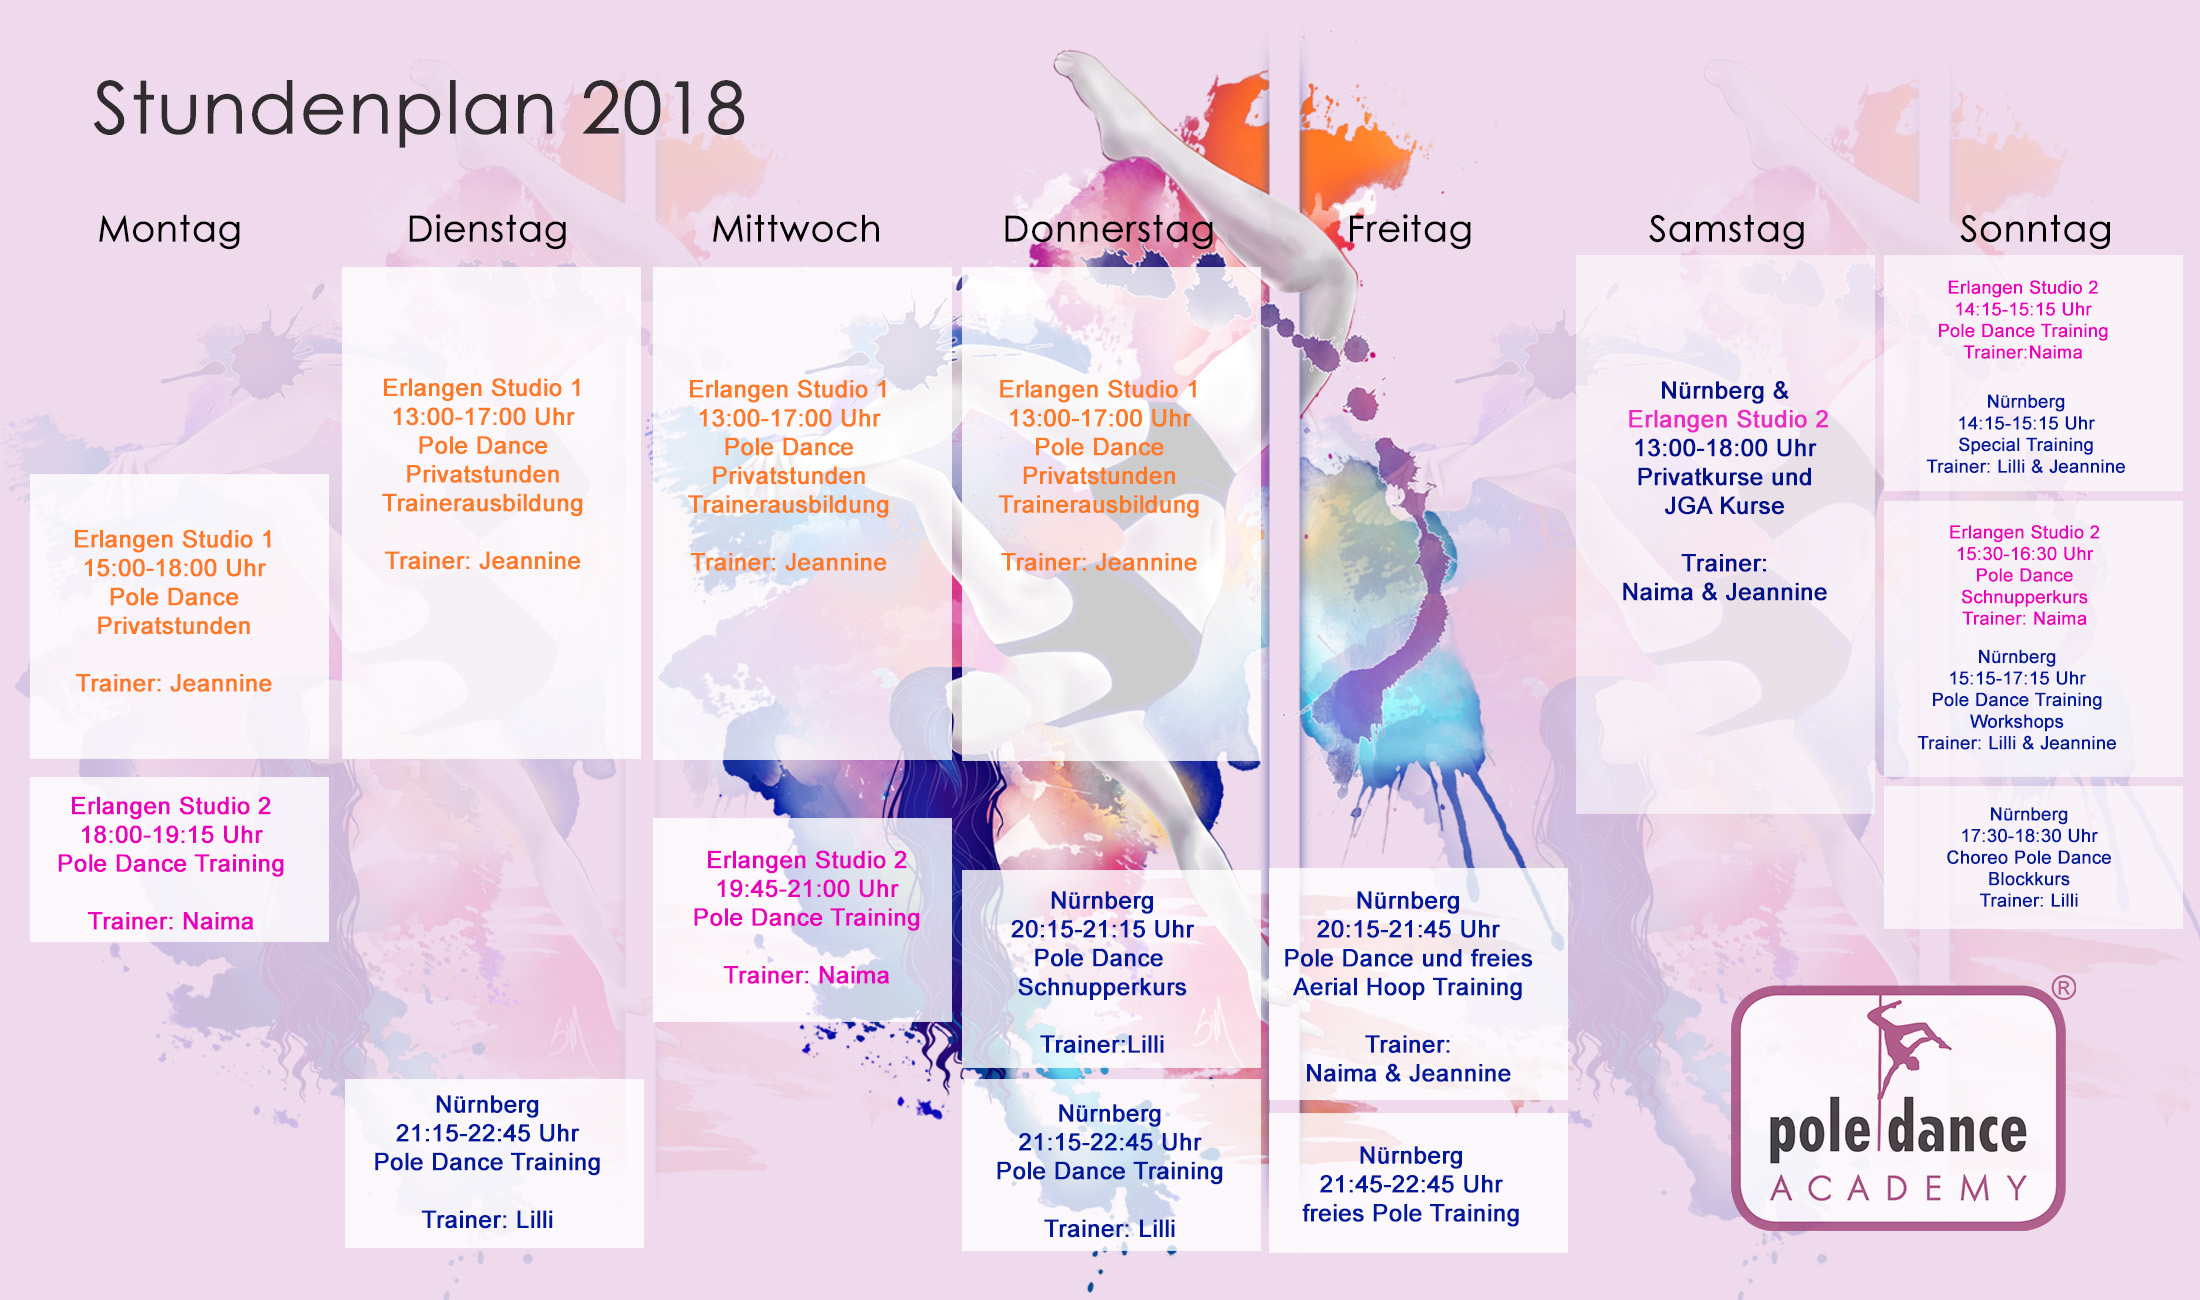 Stundenplan Pole Dance Academy 2018